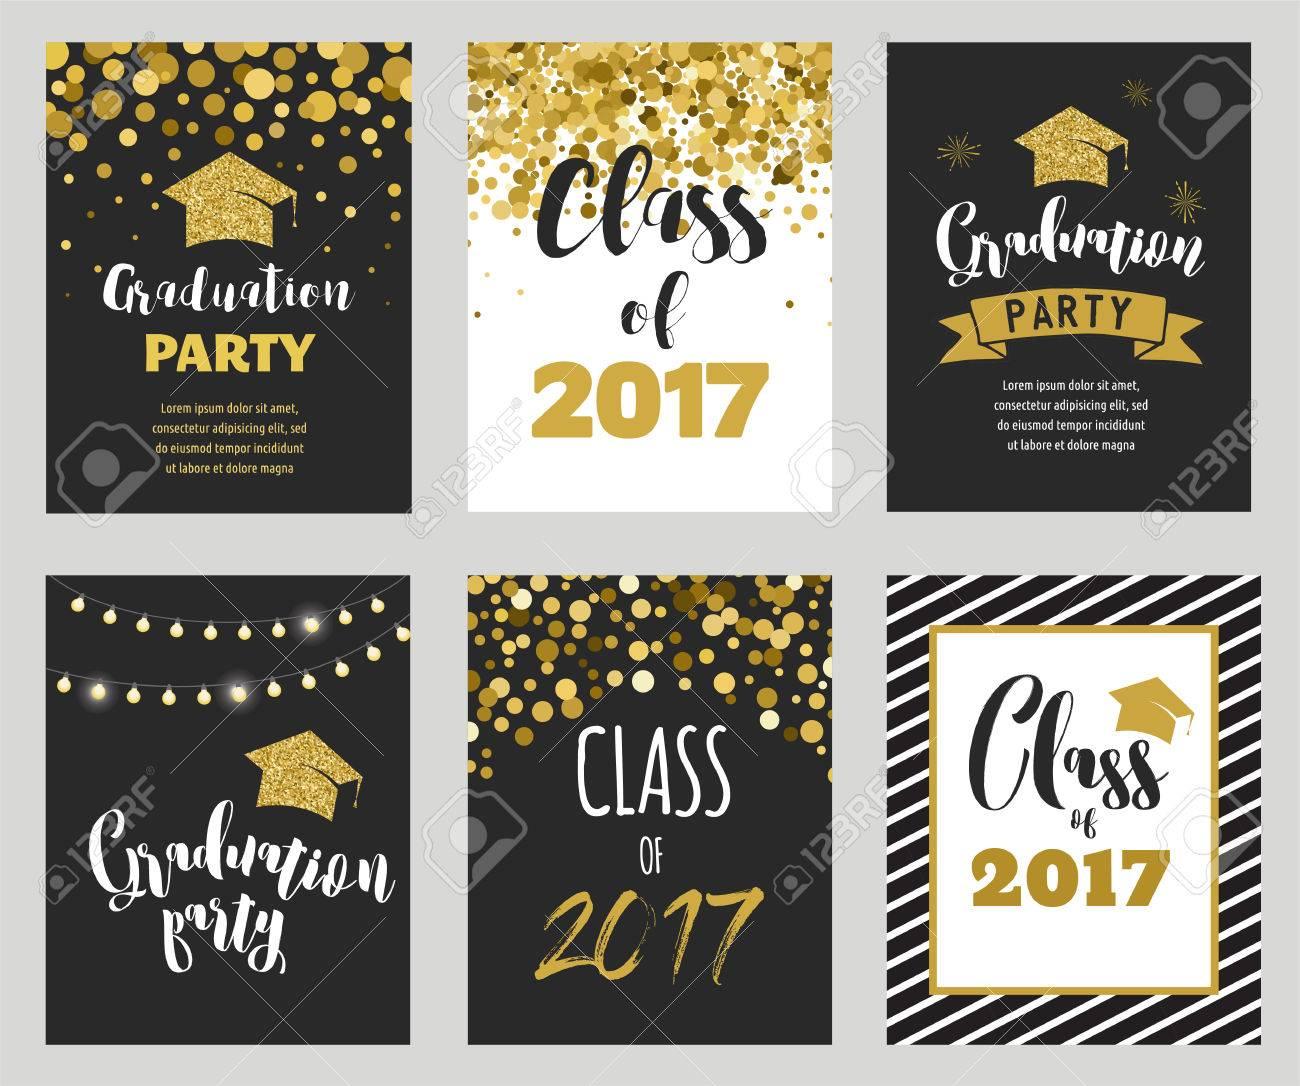 Graduation Class of 2017, party invitations - 77471925